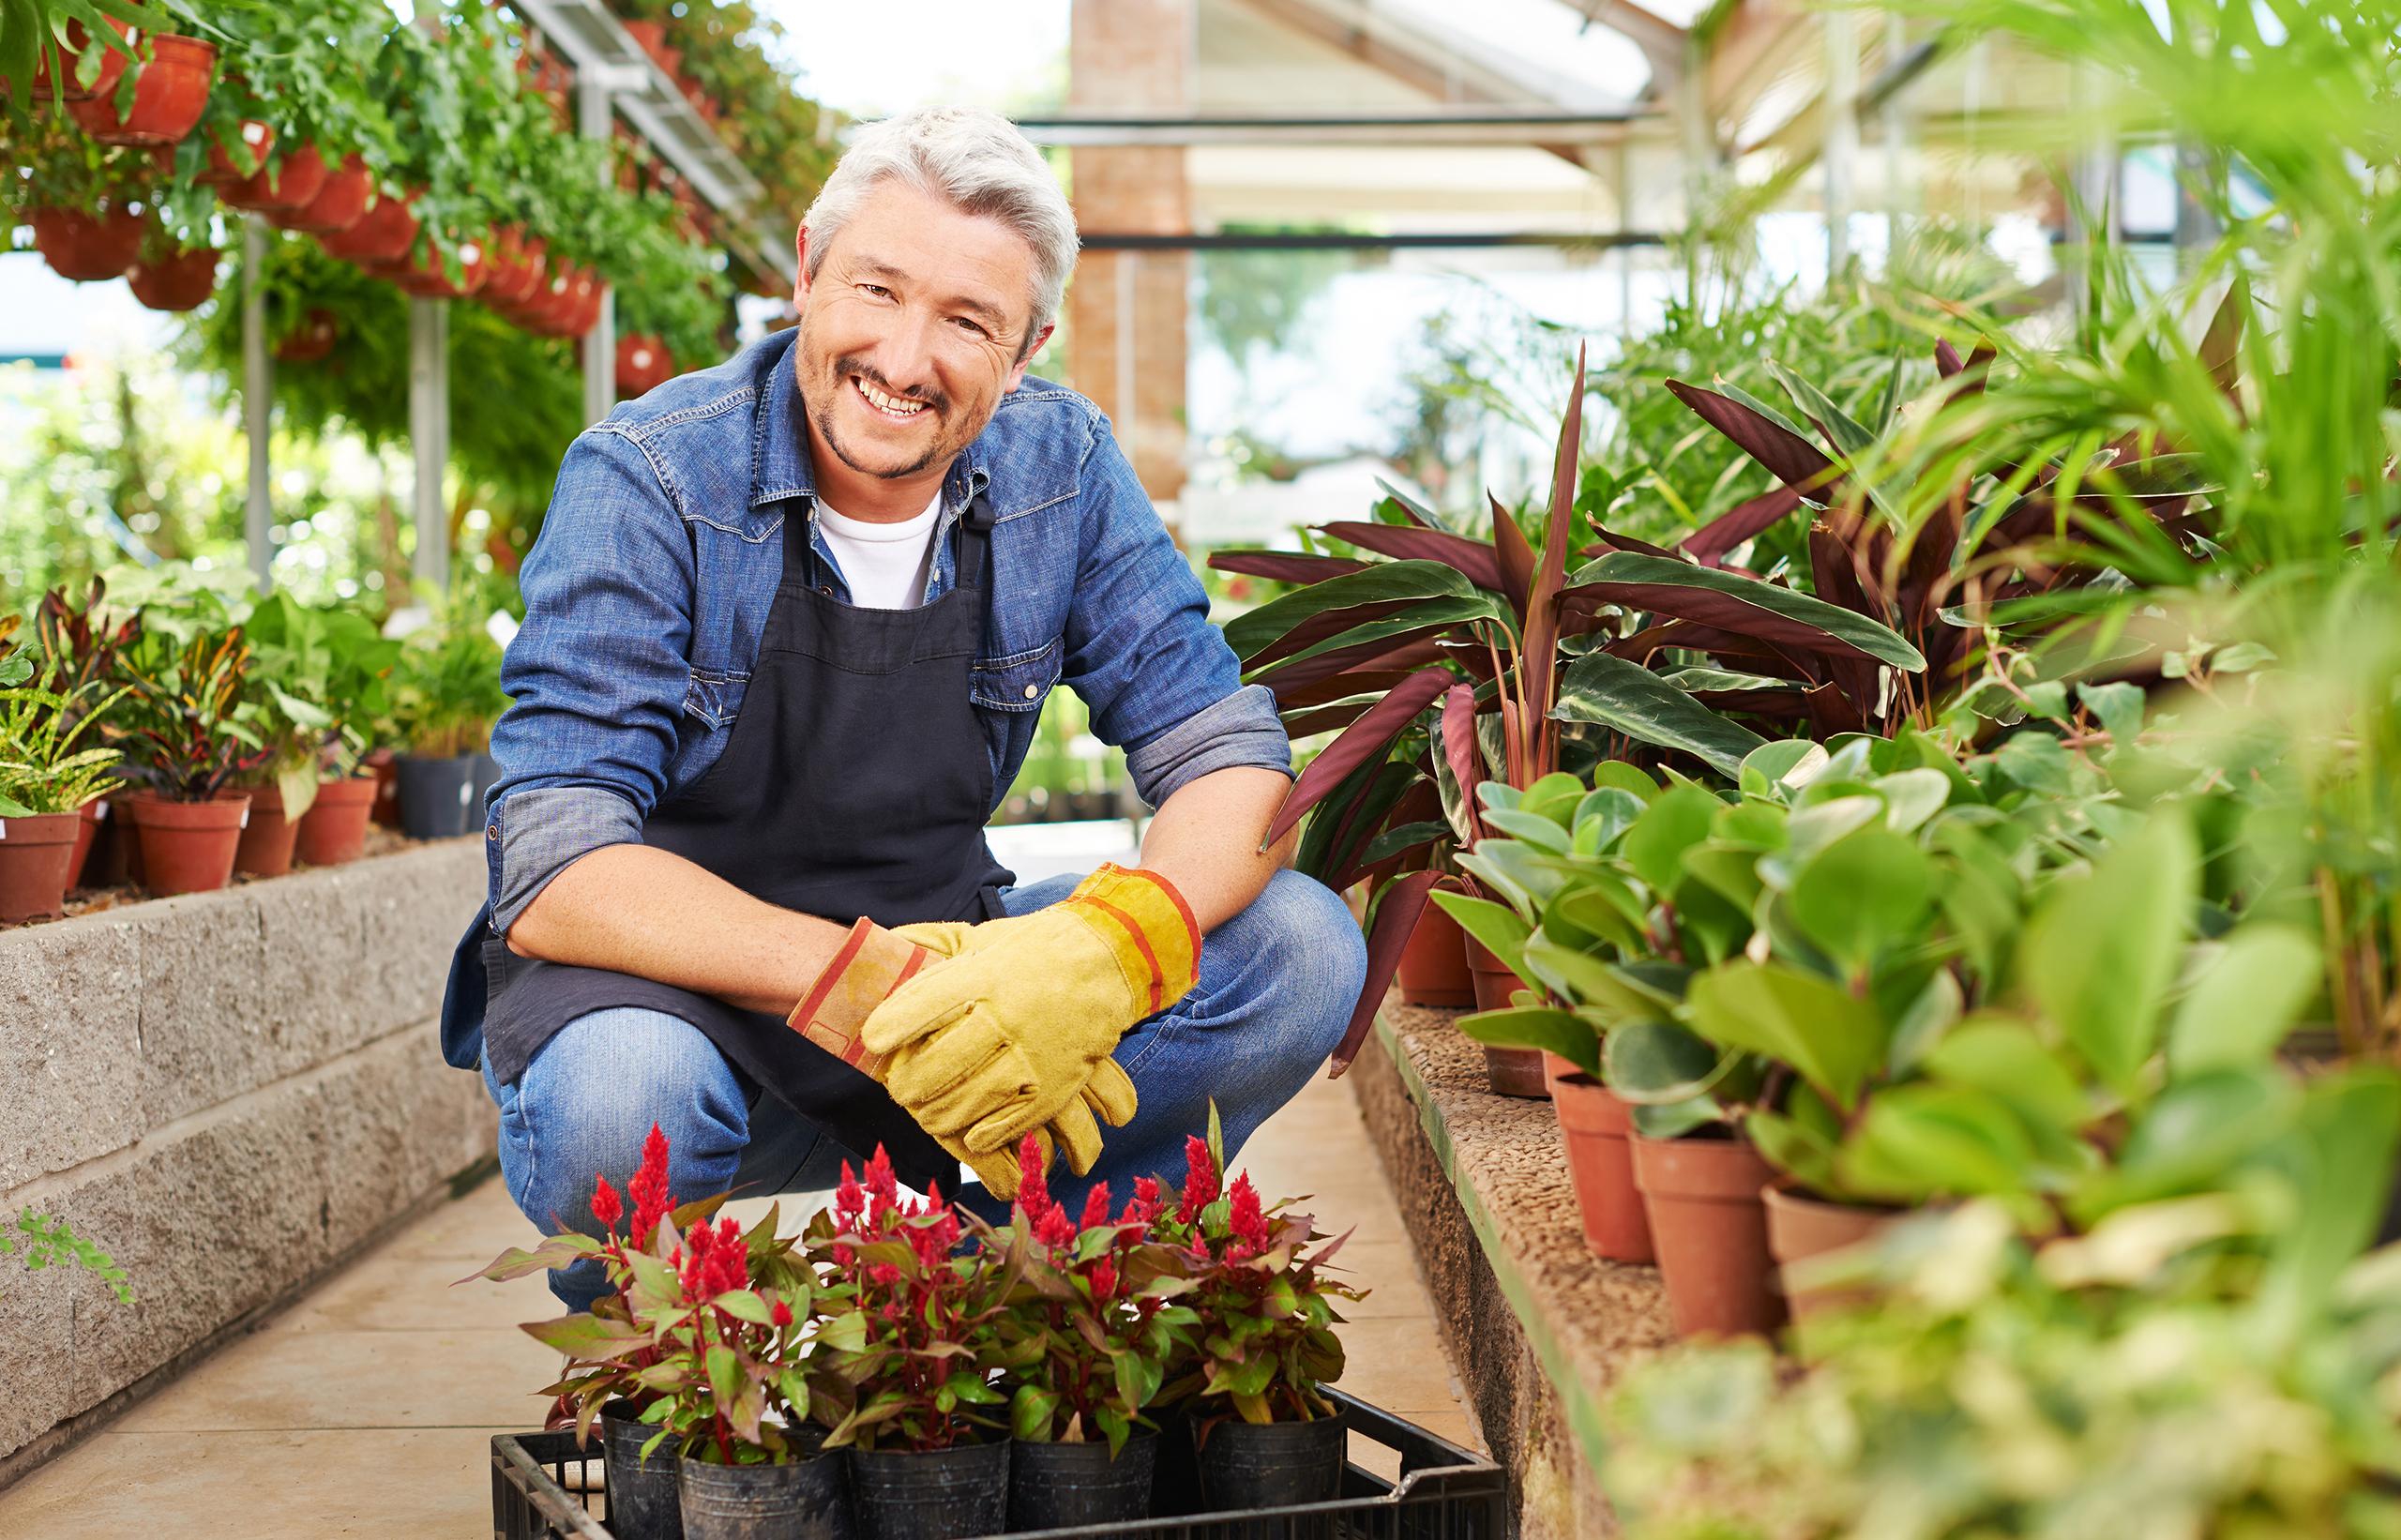 quels-sont-les-différents-métiers-de-l'horticulture